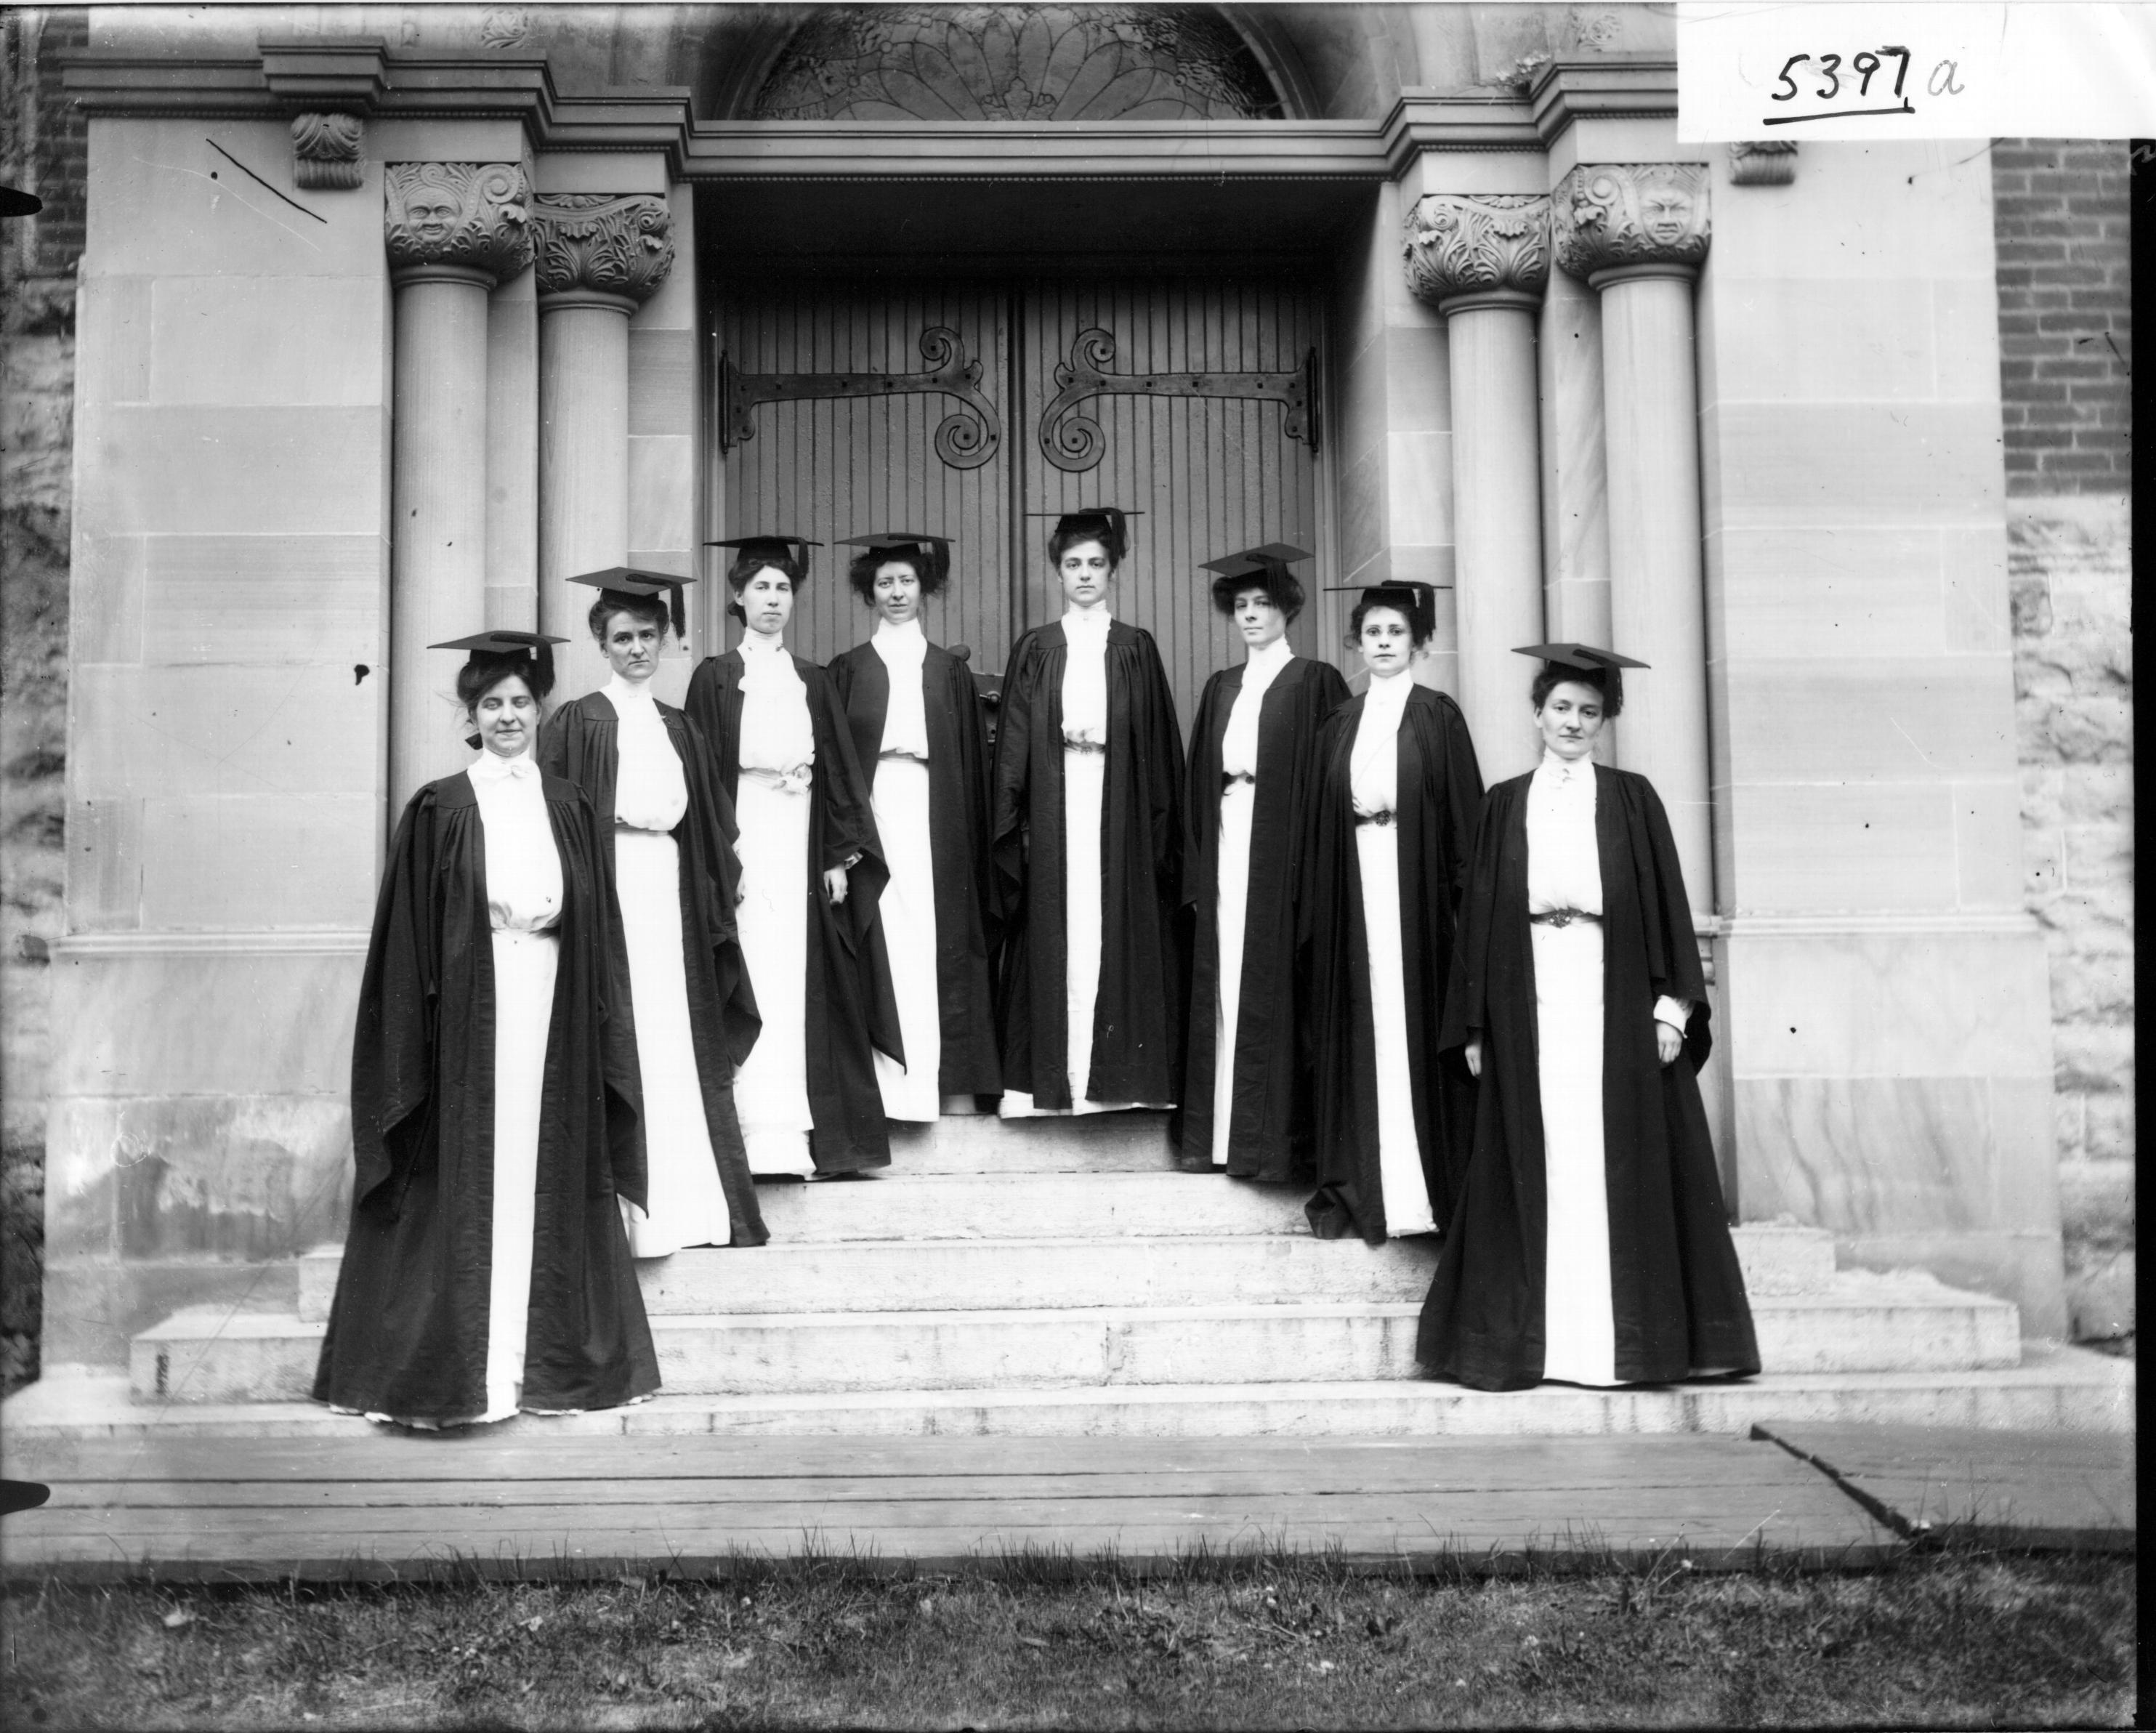 women in cap and gown